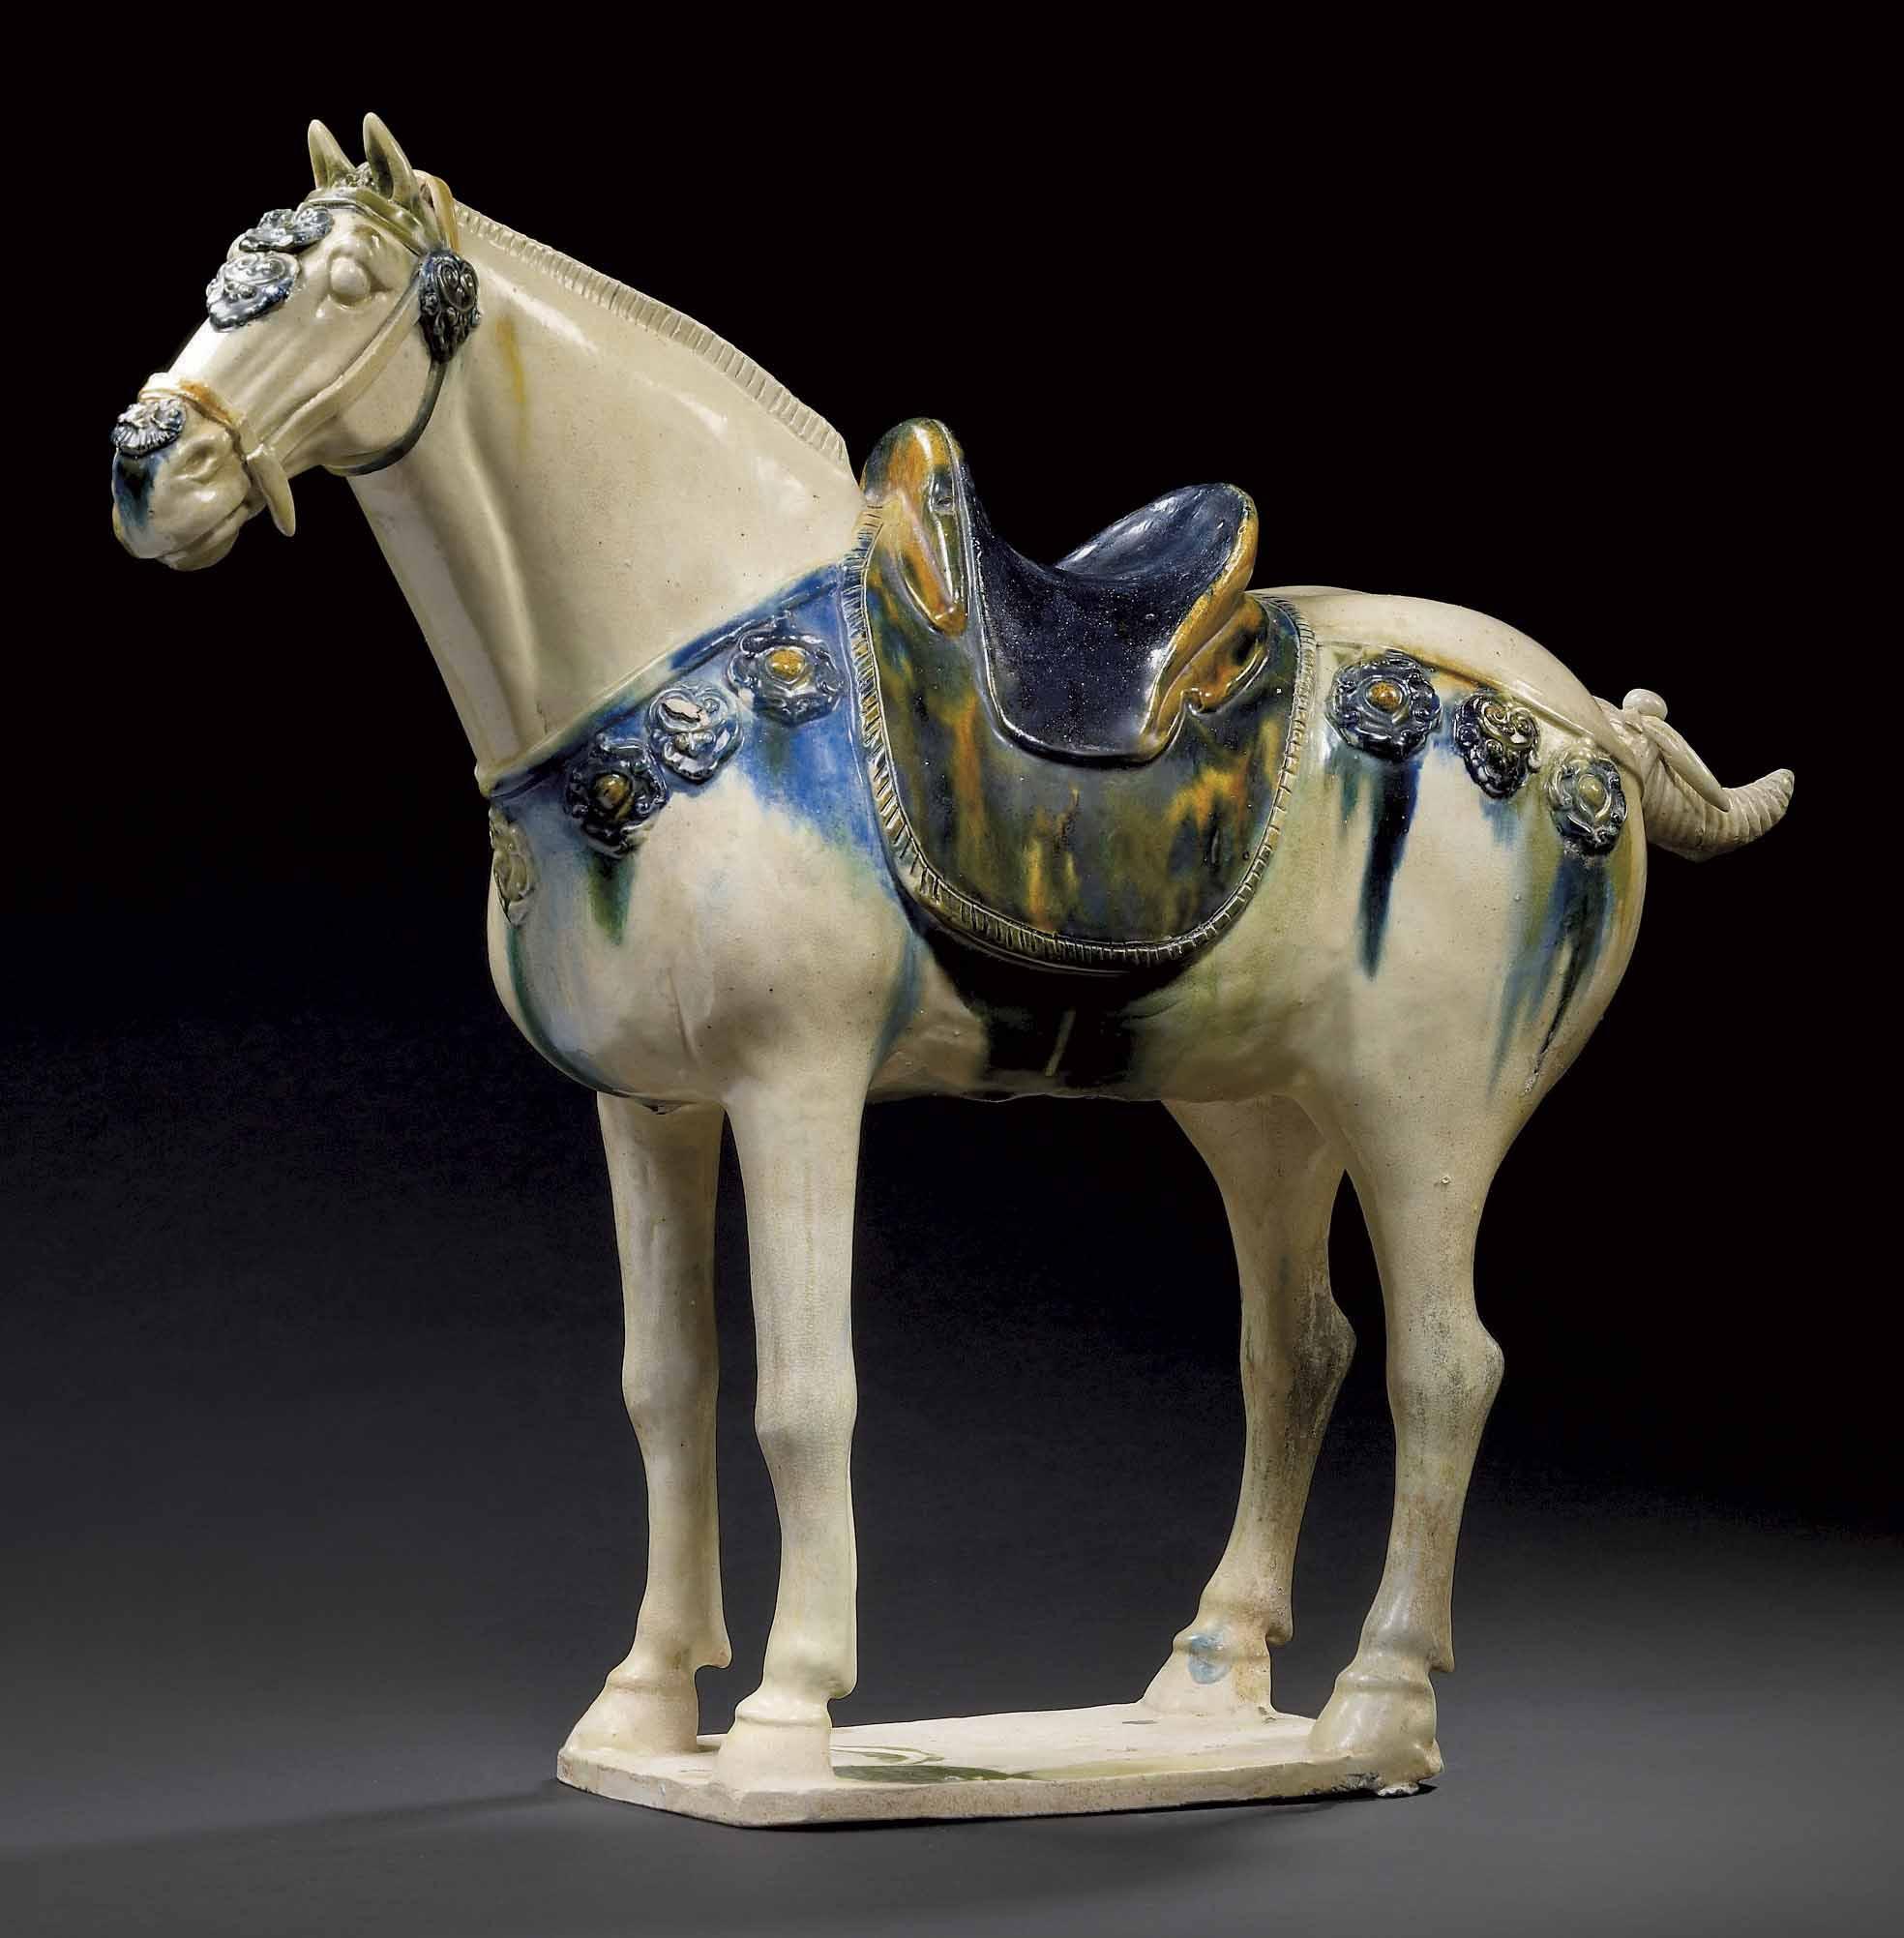 cheval en terre cuite emaillee bleue et sancai chine dynastie tang 618 907 christie 39 s. Black Bedroom Furniture Sets. Home Design Ideas